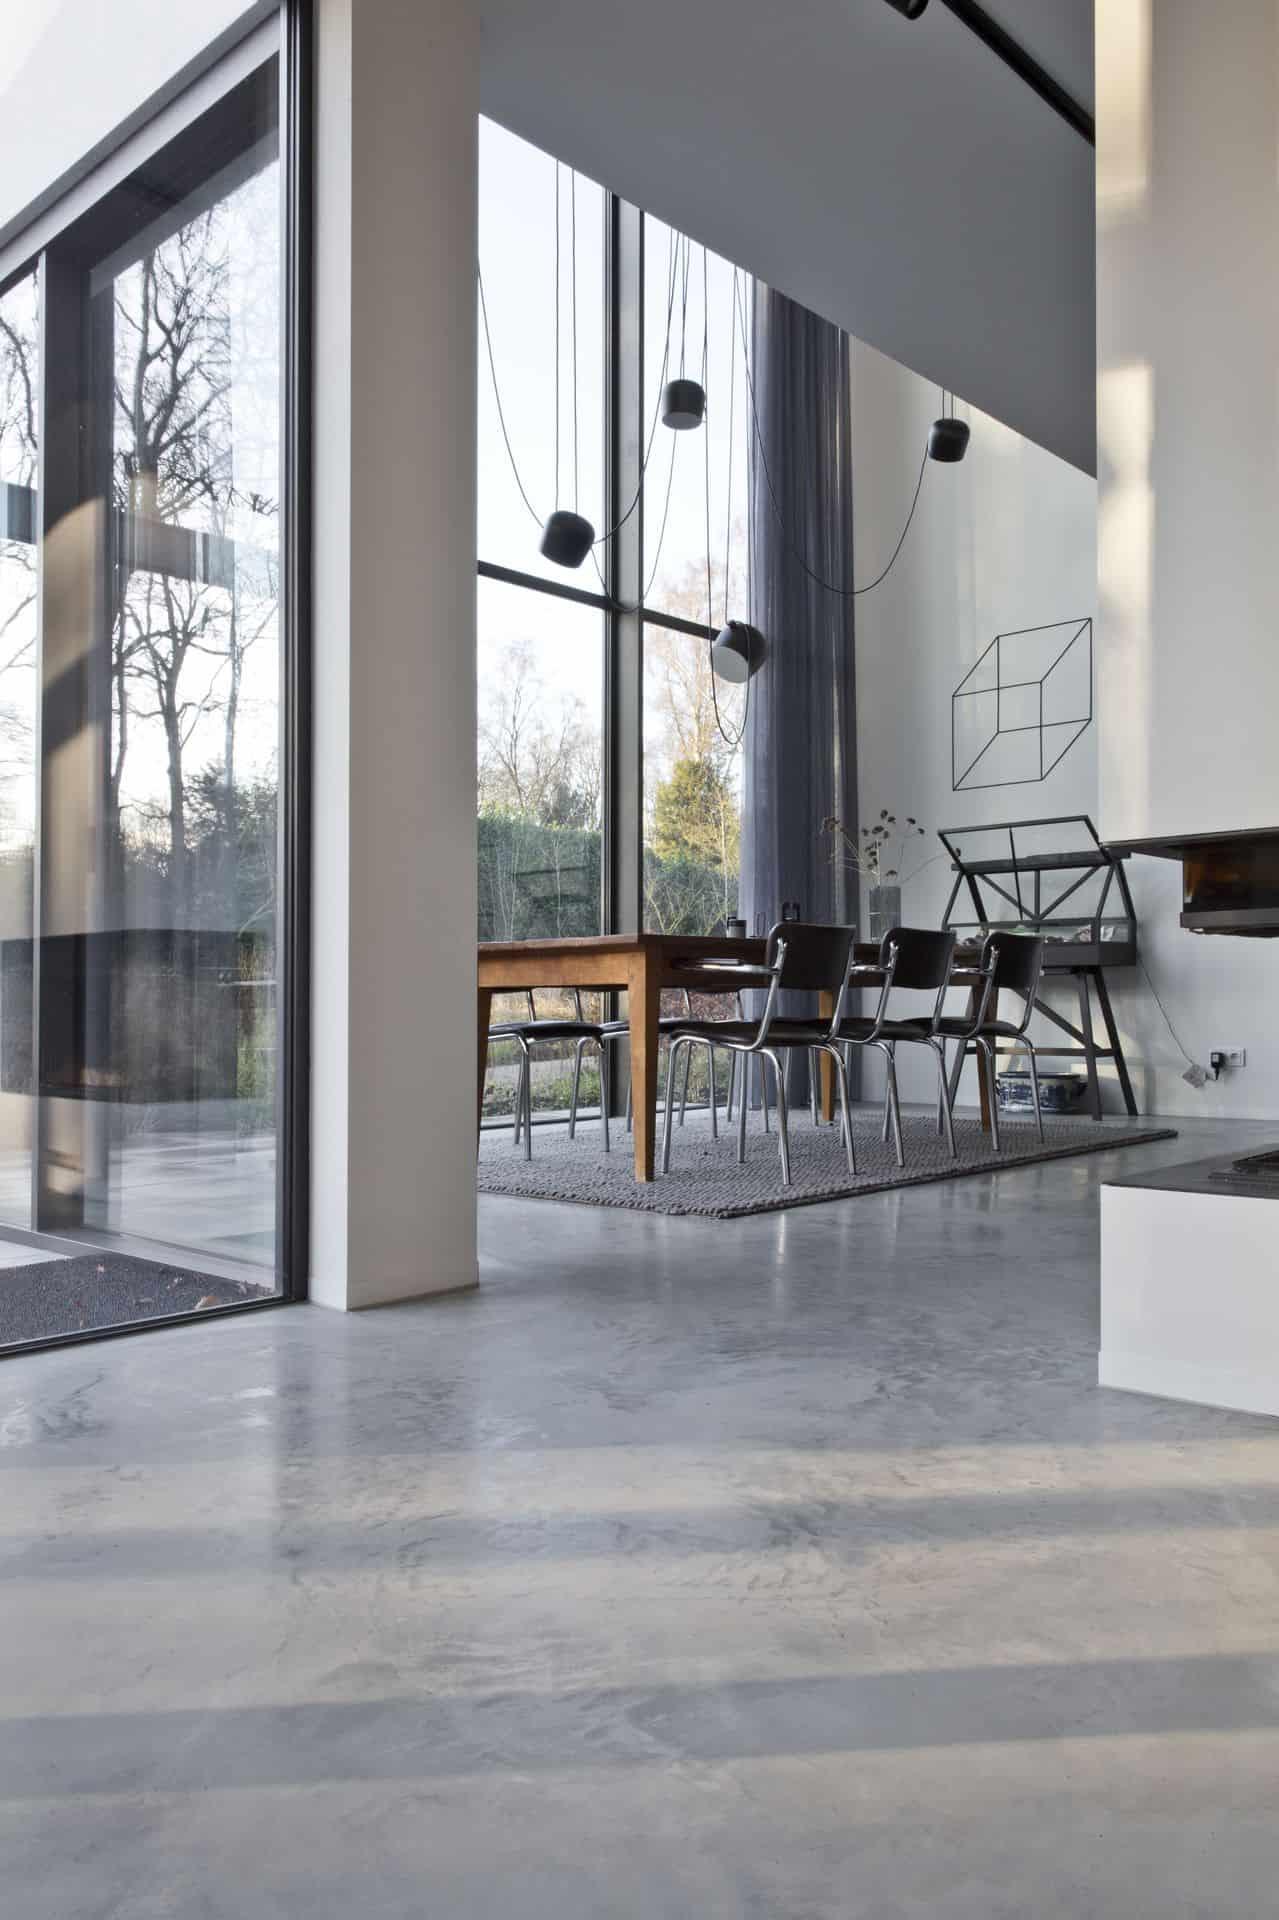 gevlinderde betonvloer met vloerisolatievloerverwarming in beton